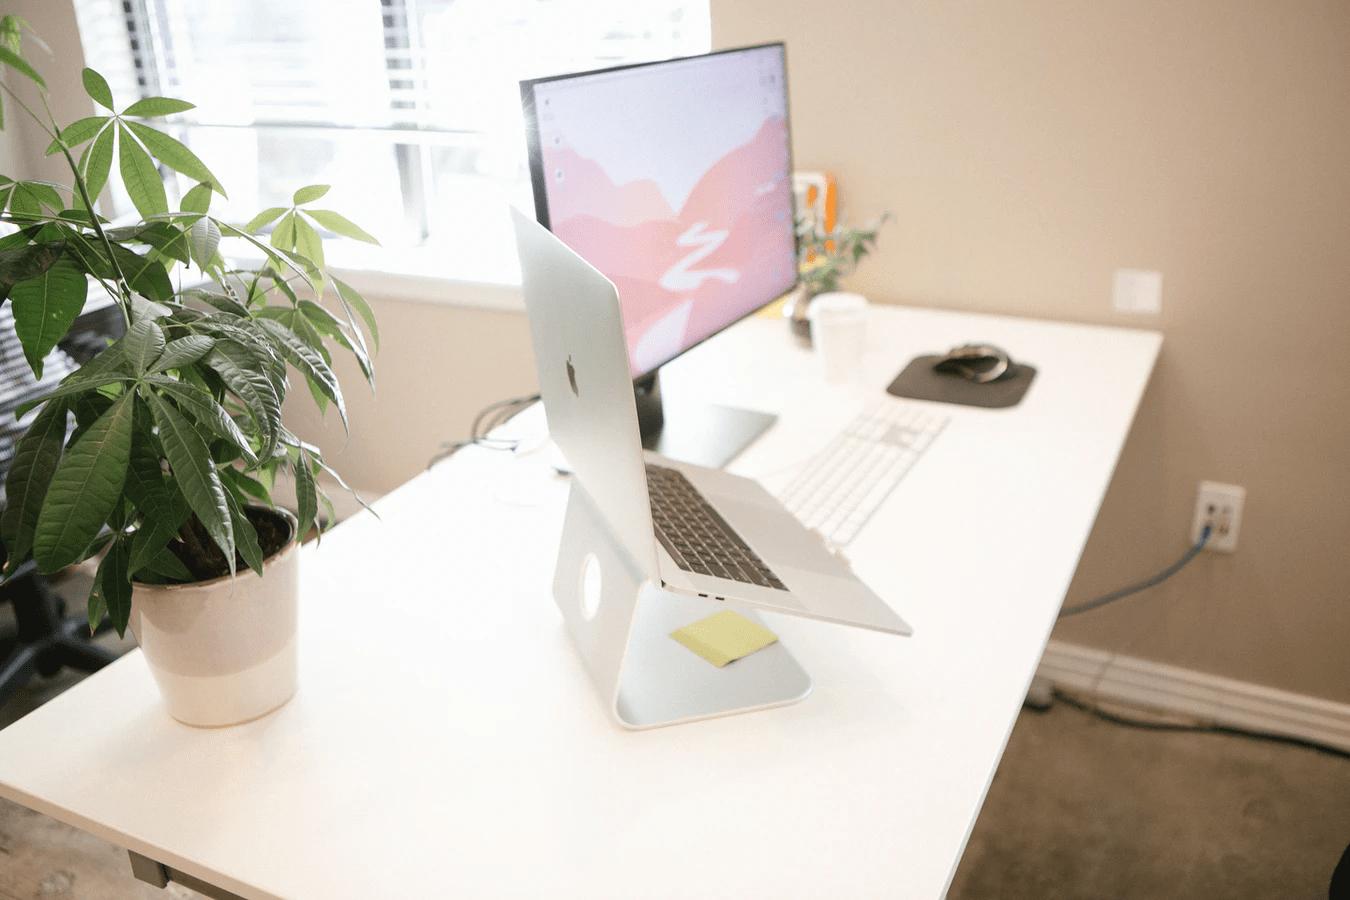 Office Space Web Design